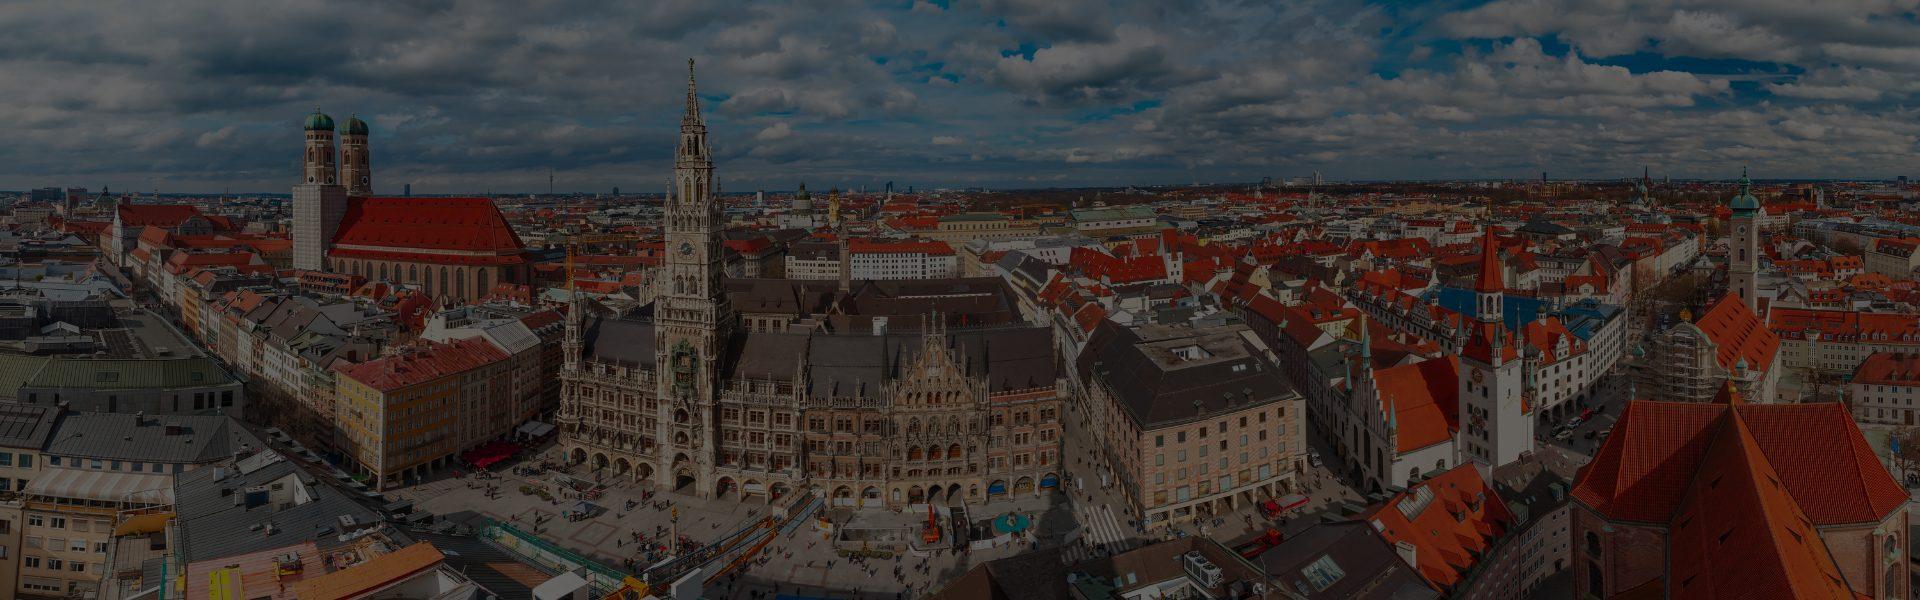 Munich sightseeing